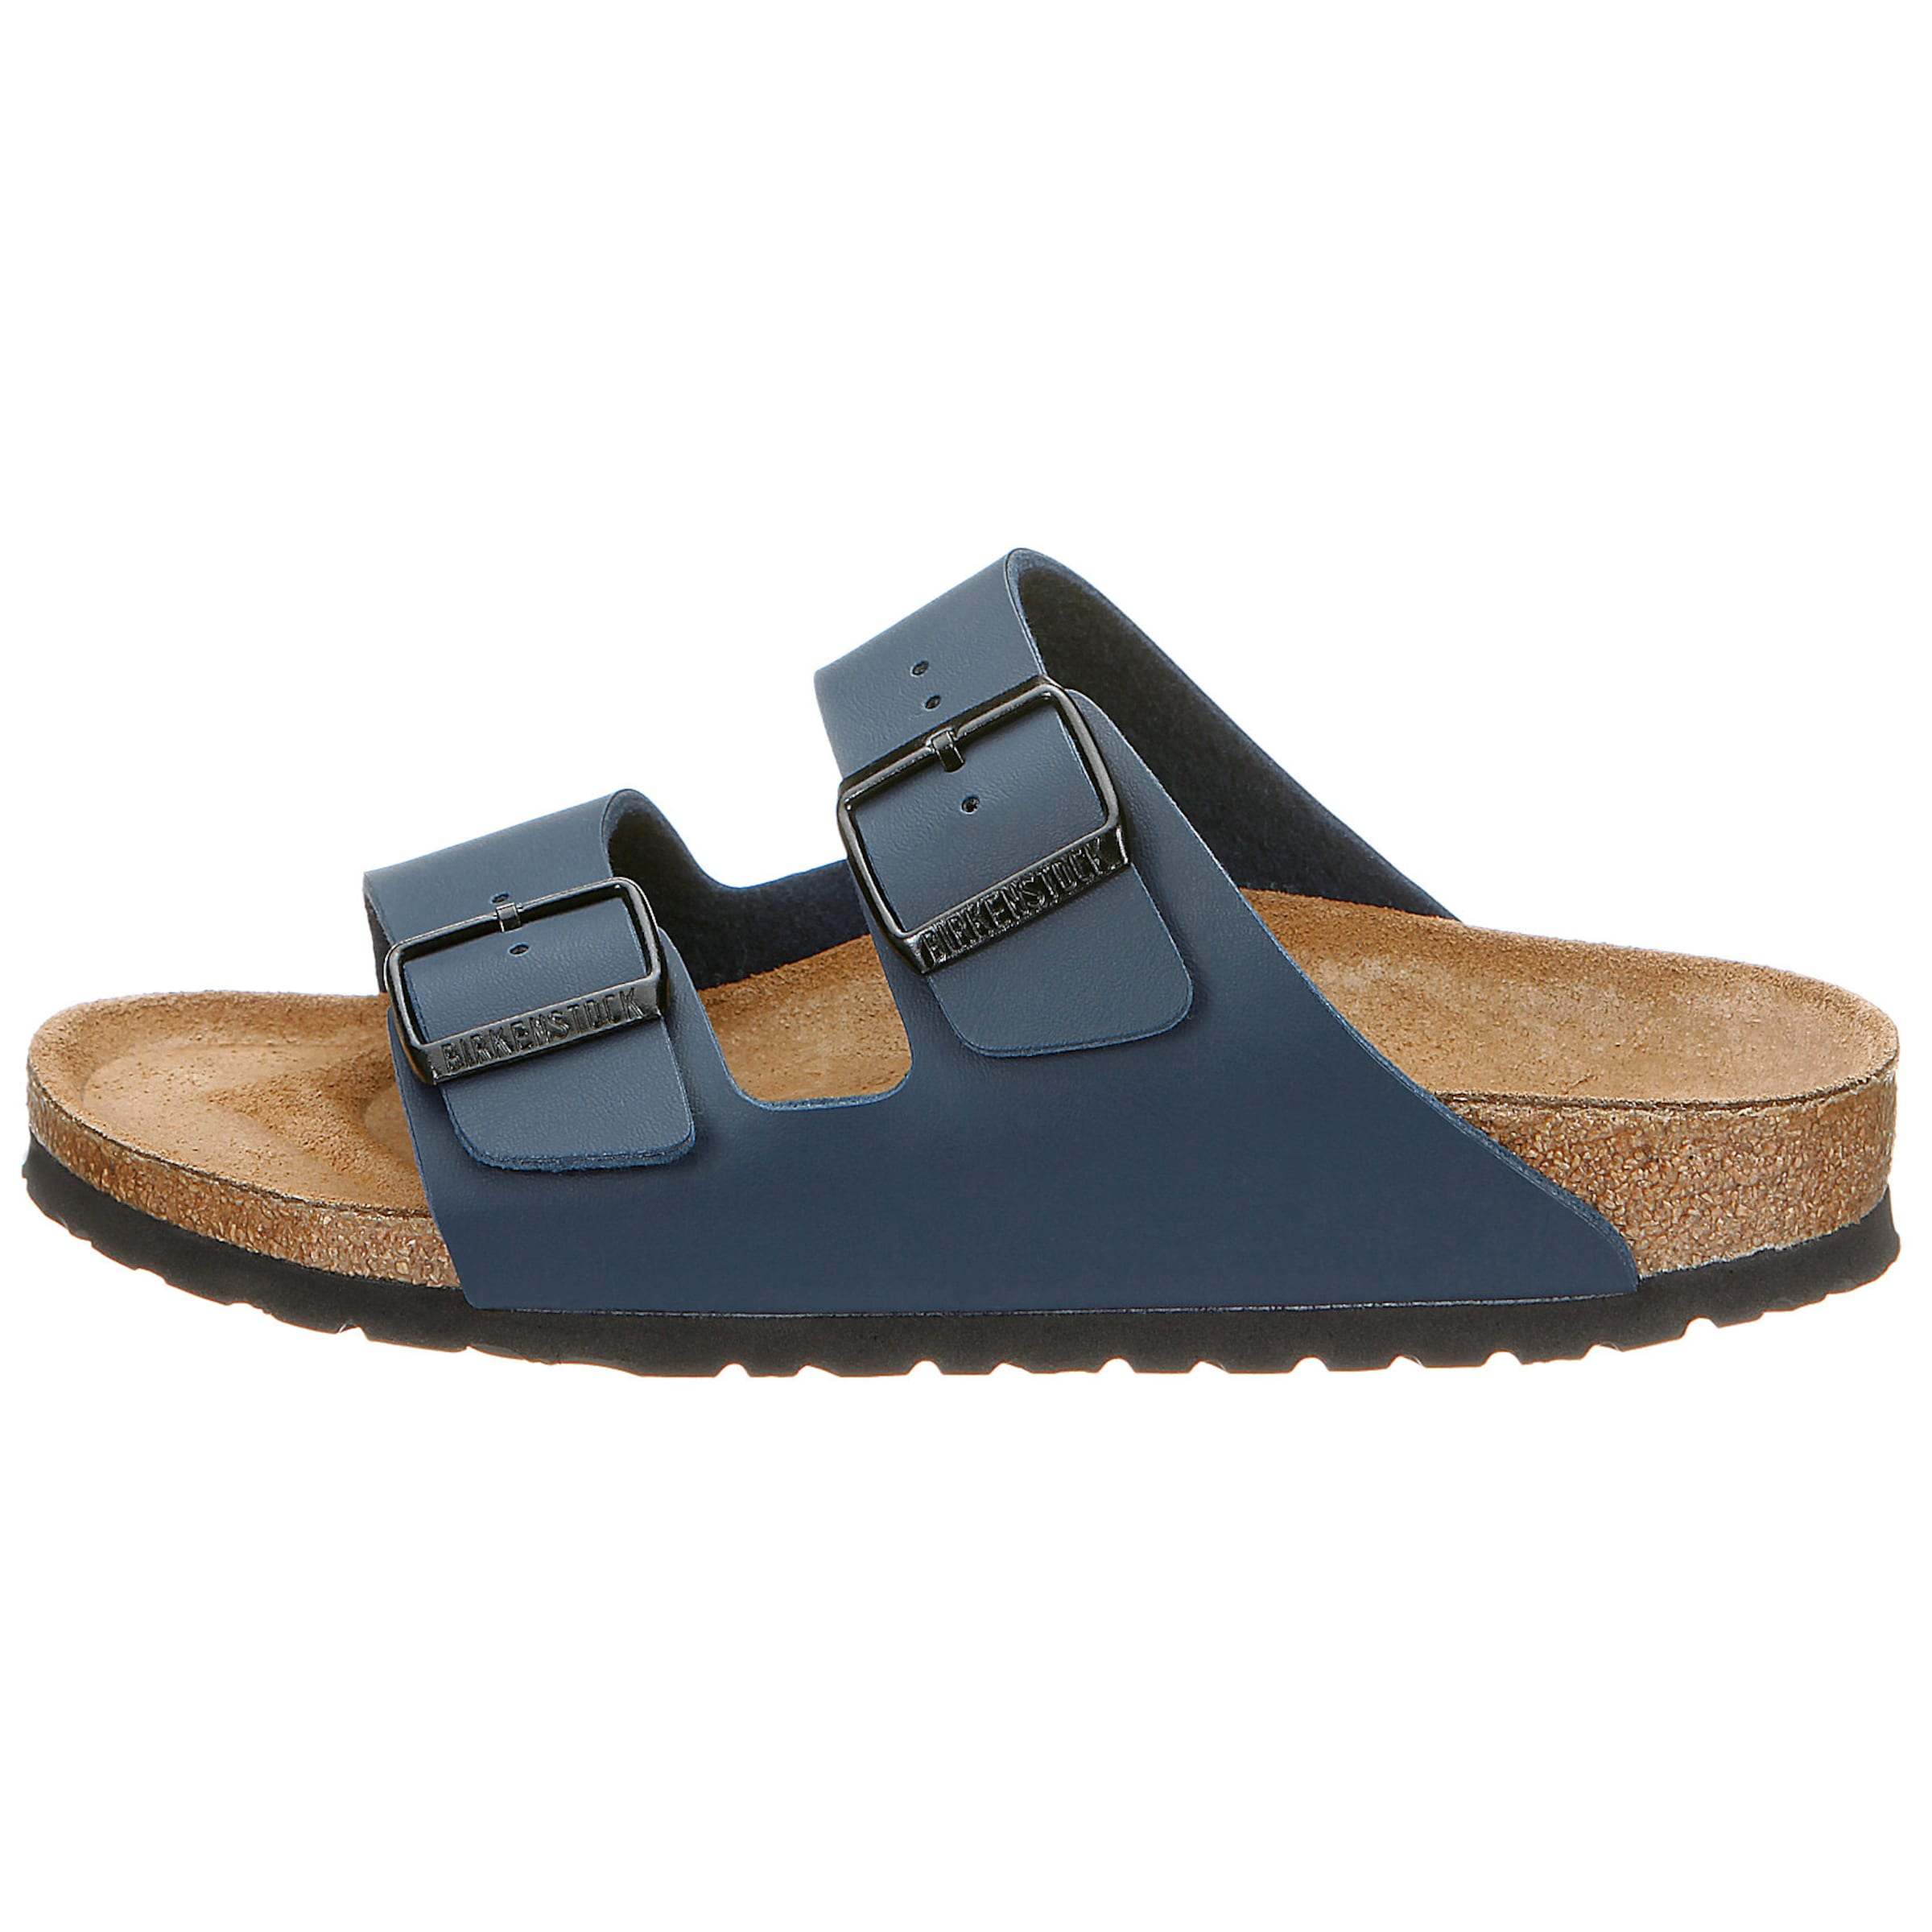 Sandale In Blau Birkenstock Birkenstock 'arizona' T3F1JcluK